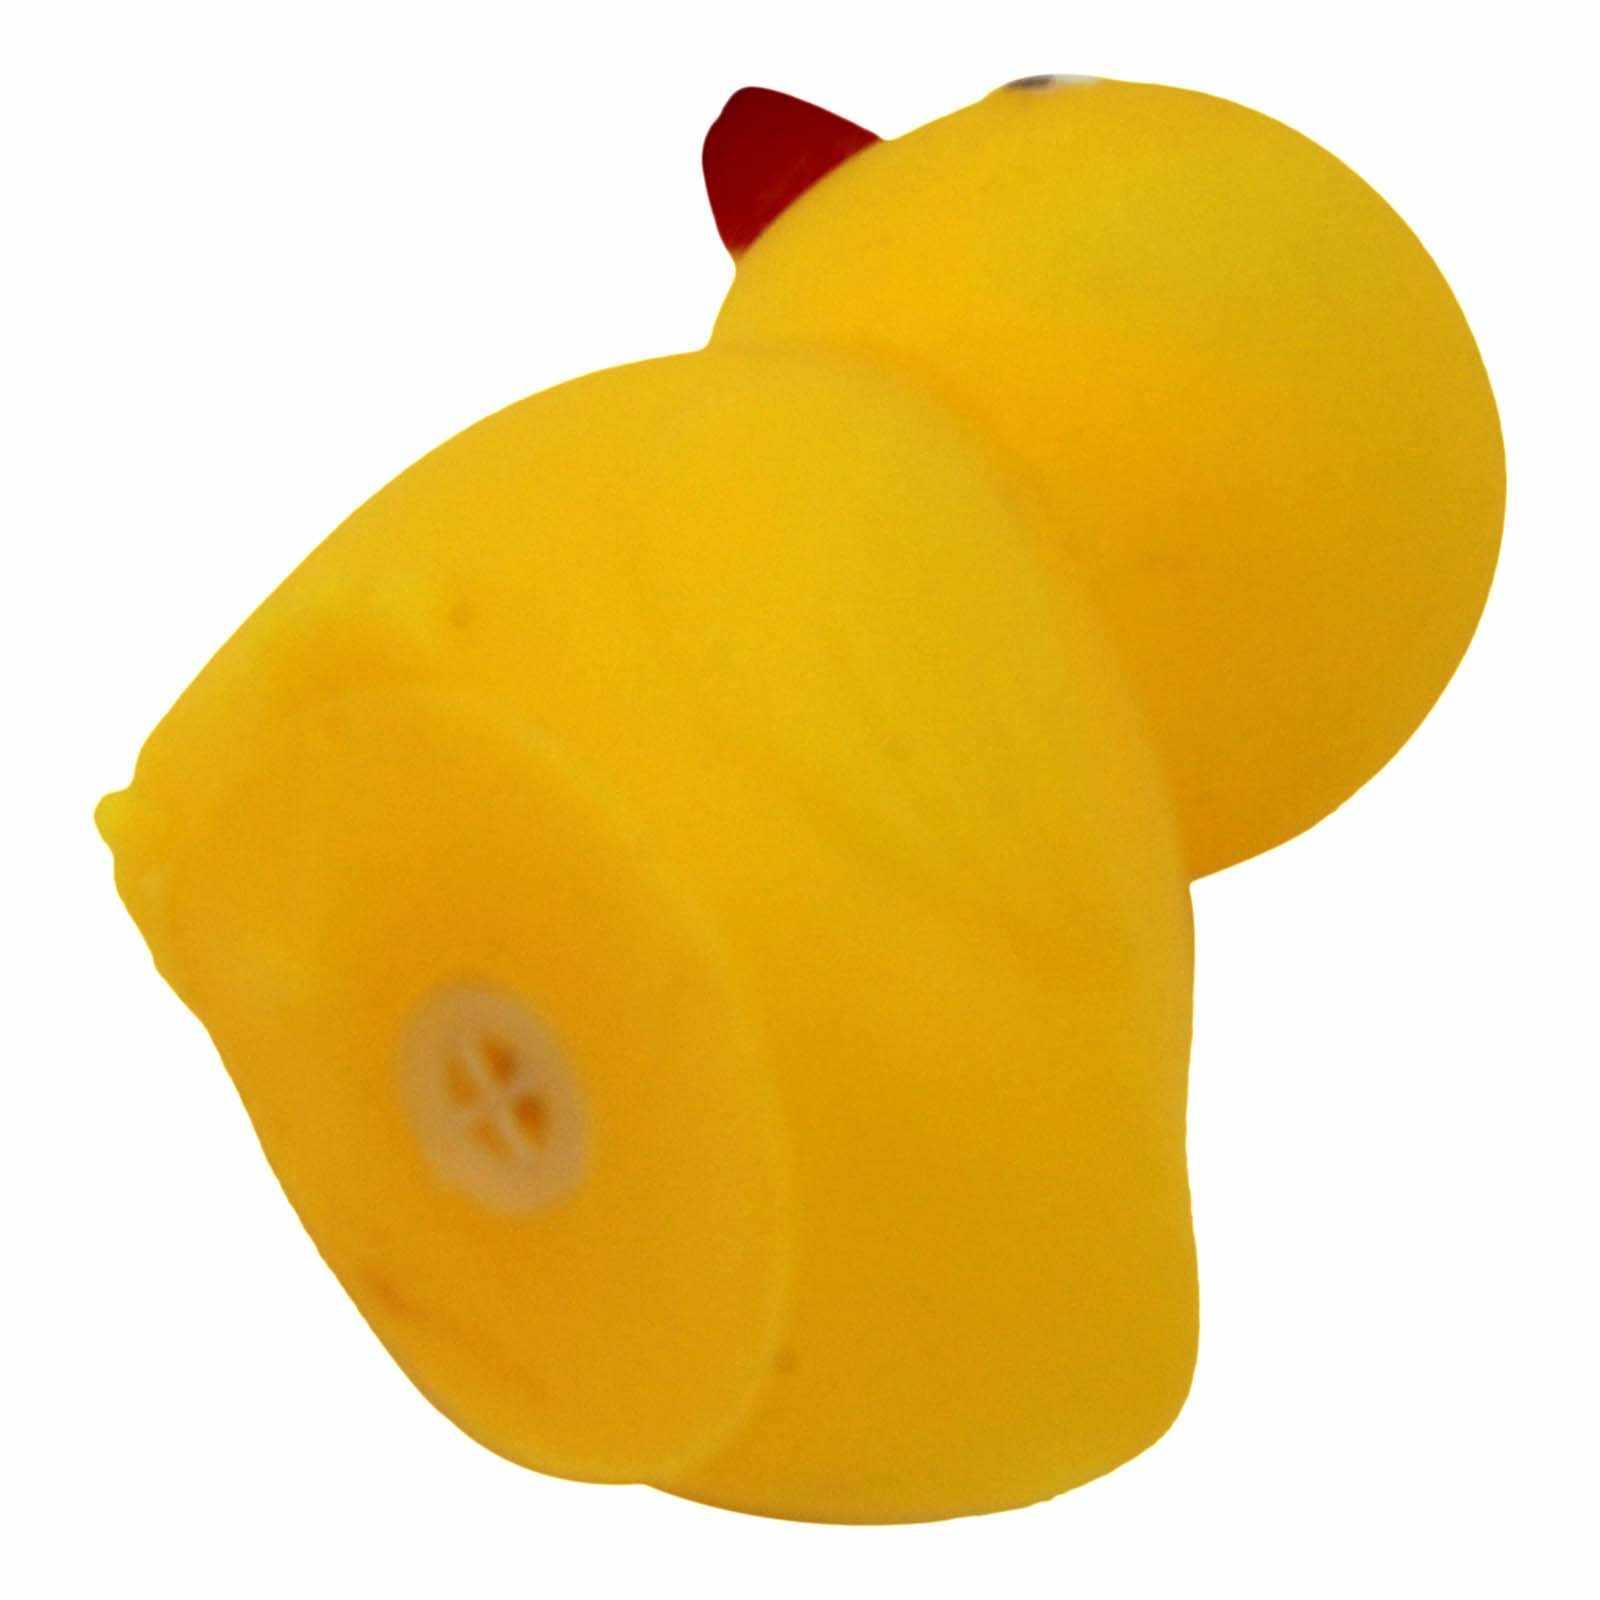 12 Pcs/set Baru Lucu 12 Jenis Hewan Bayi Anak Mandi Shower Mainan Kolam Renang Permainan